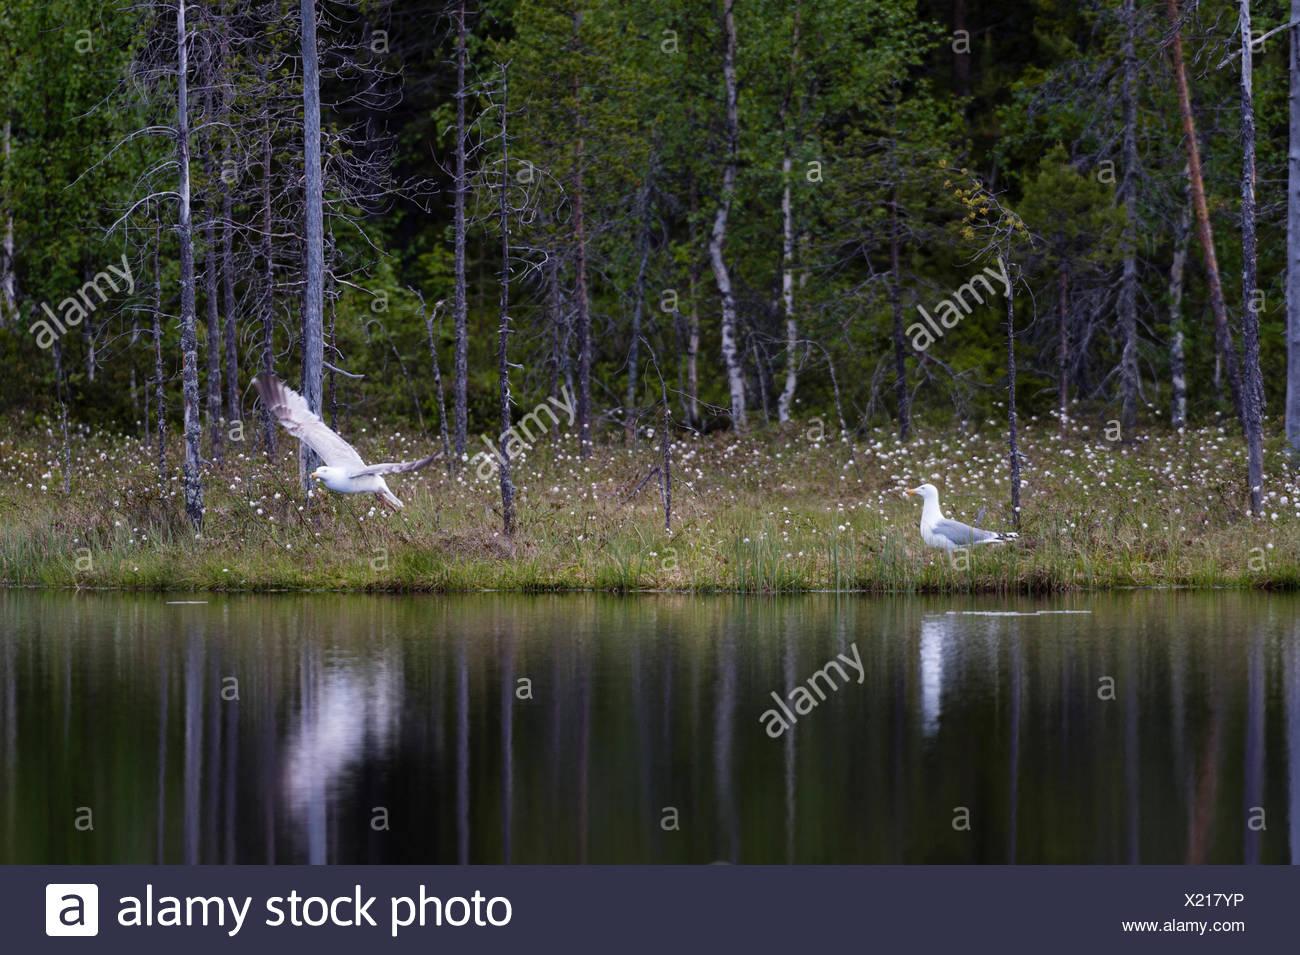 Herring gulls,Larus argentatus,along a forested lake shore. - Stock Image